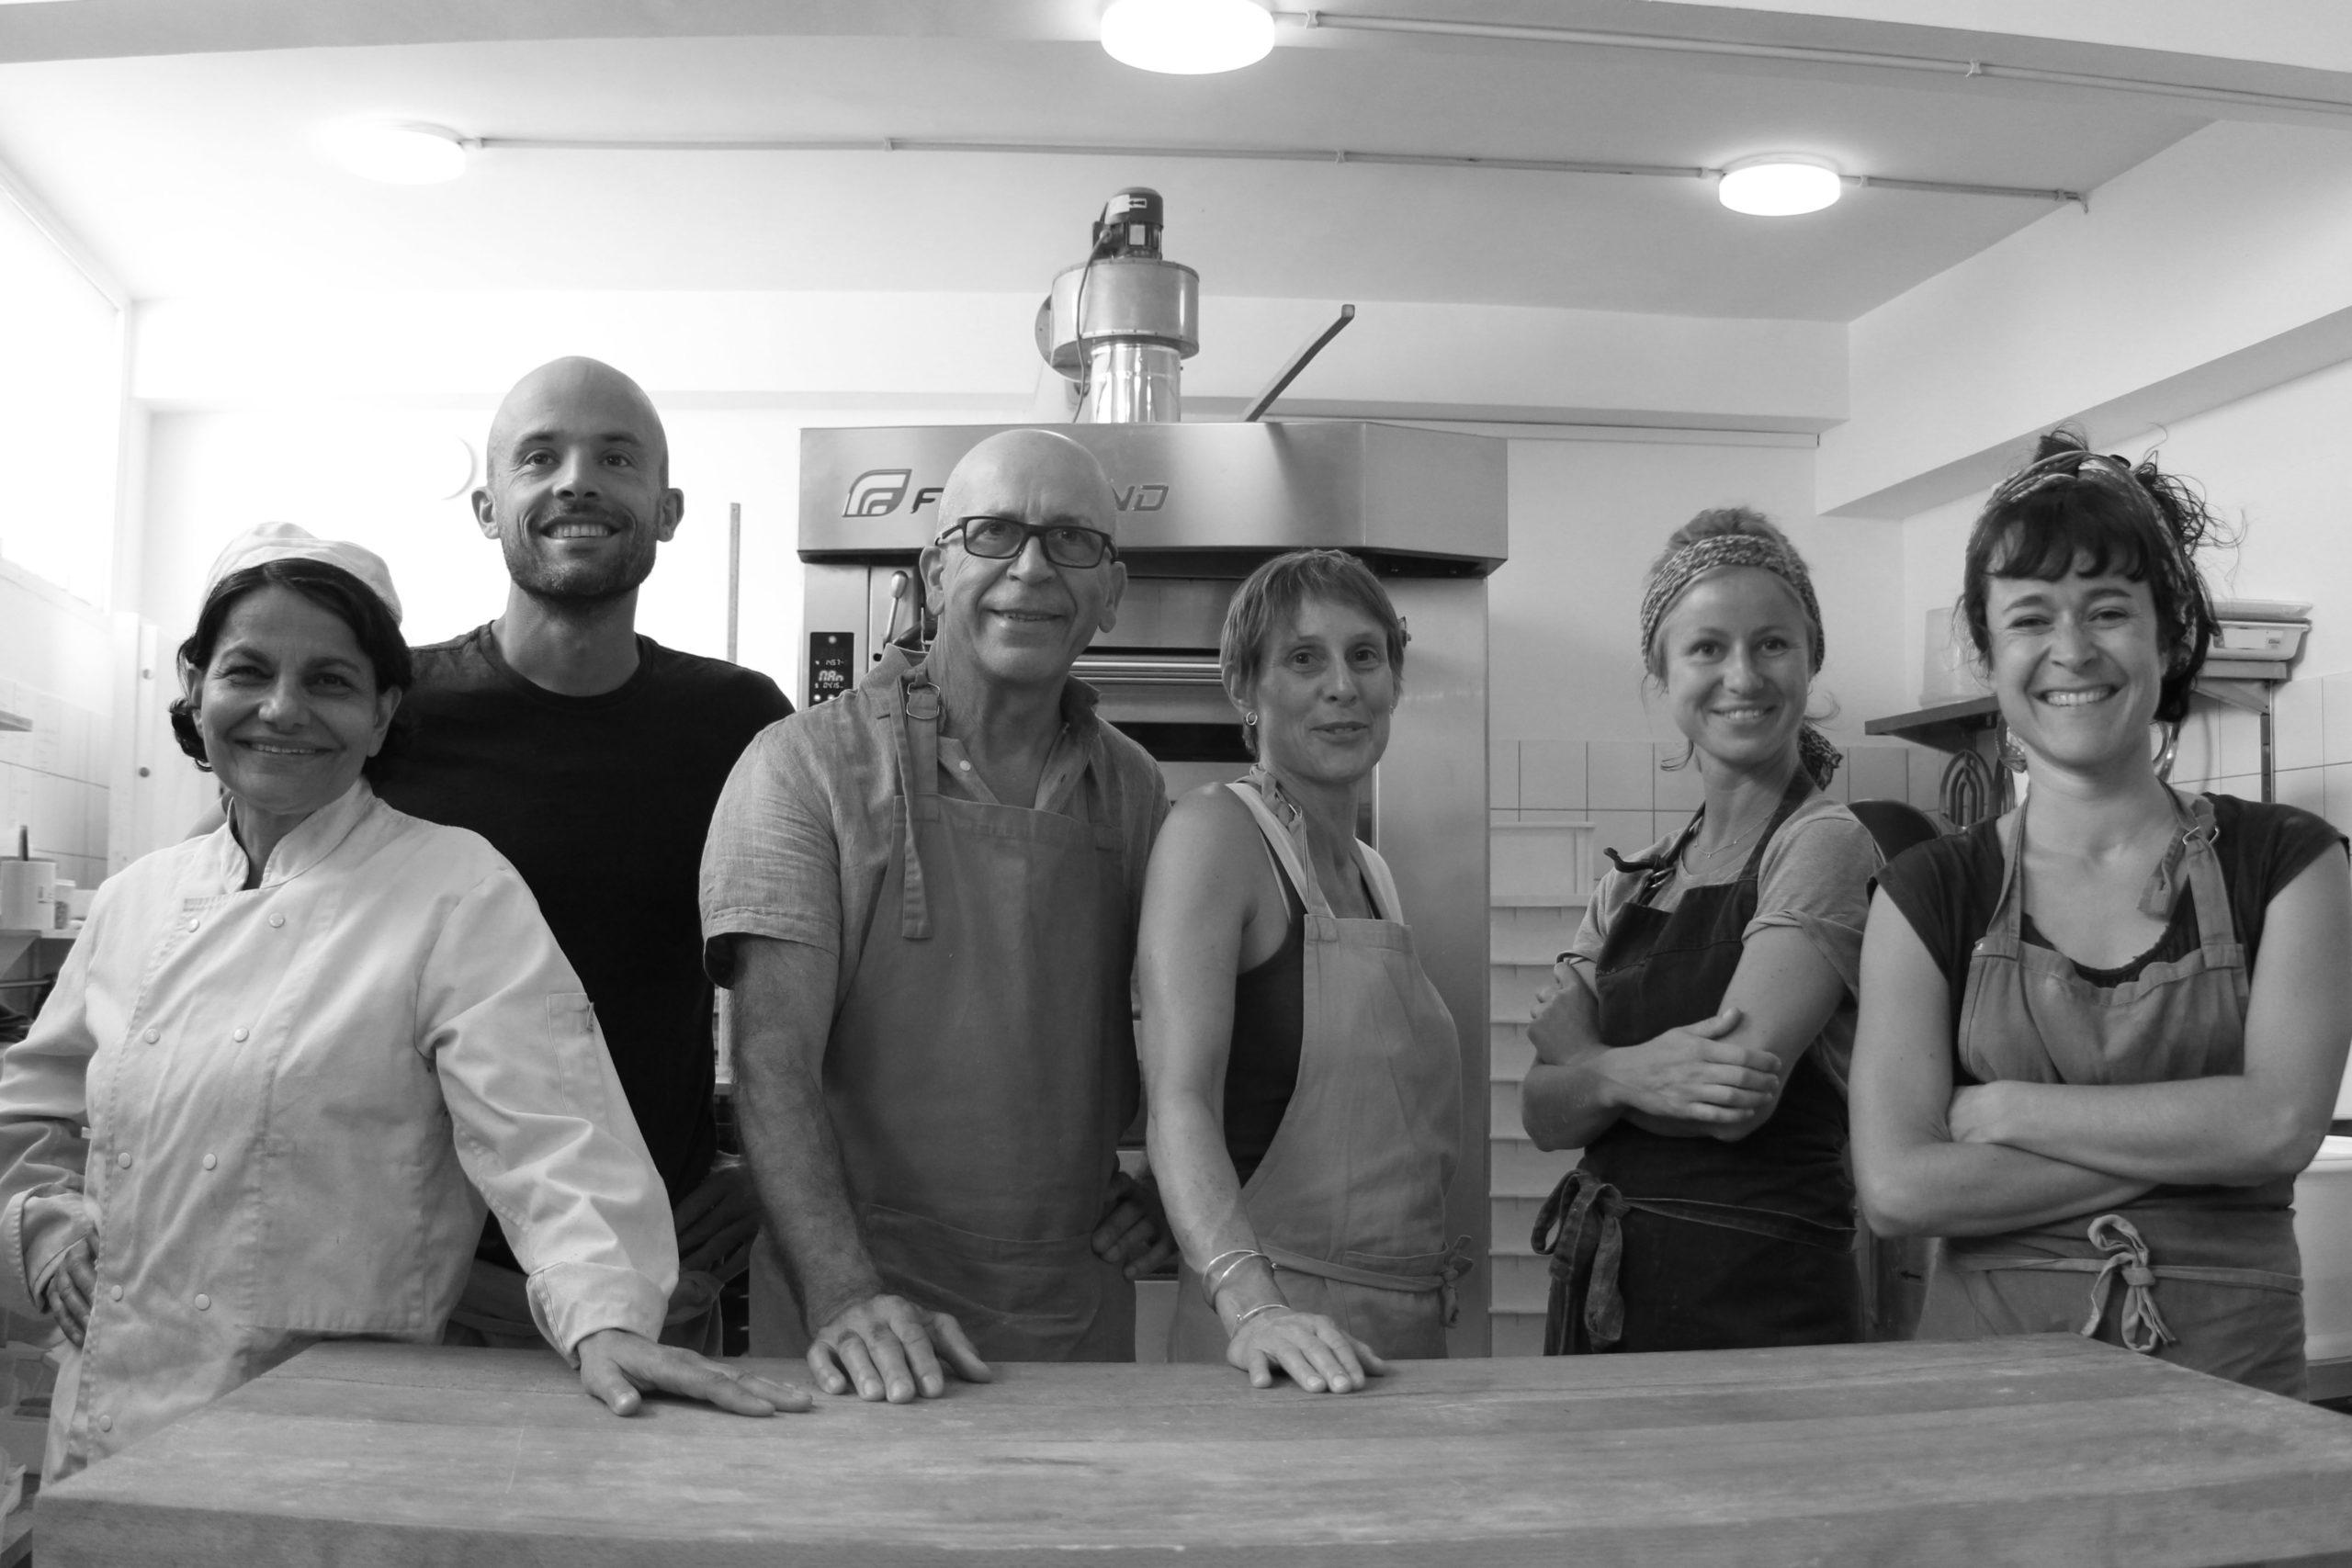 L'équipe du pain salvator